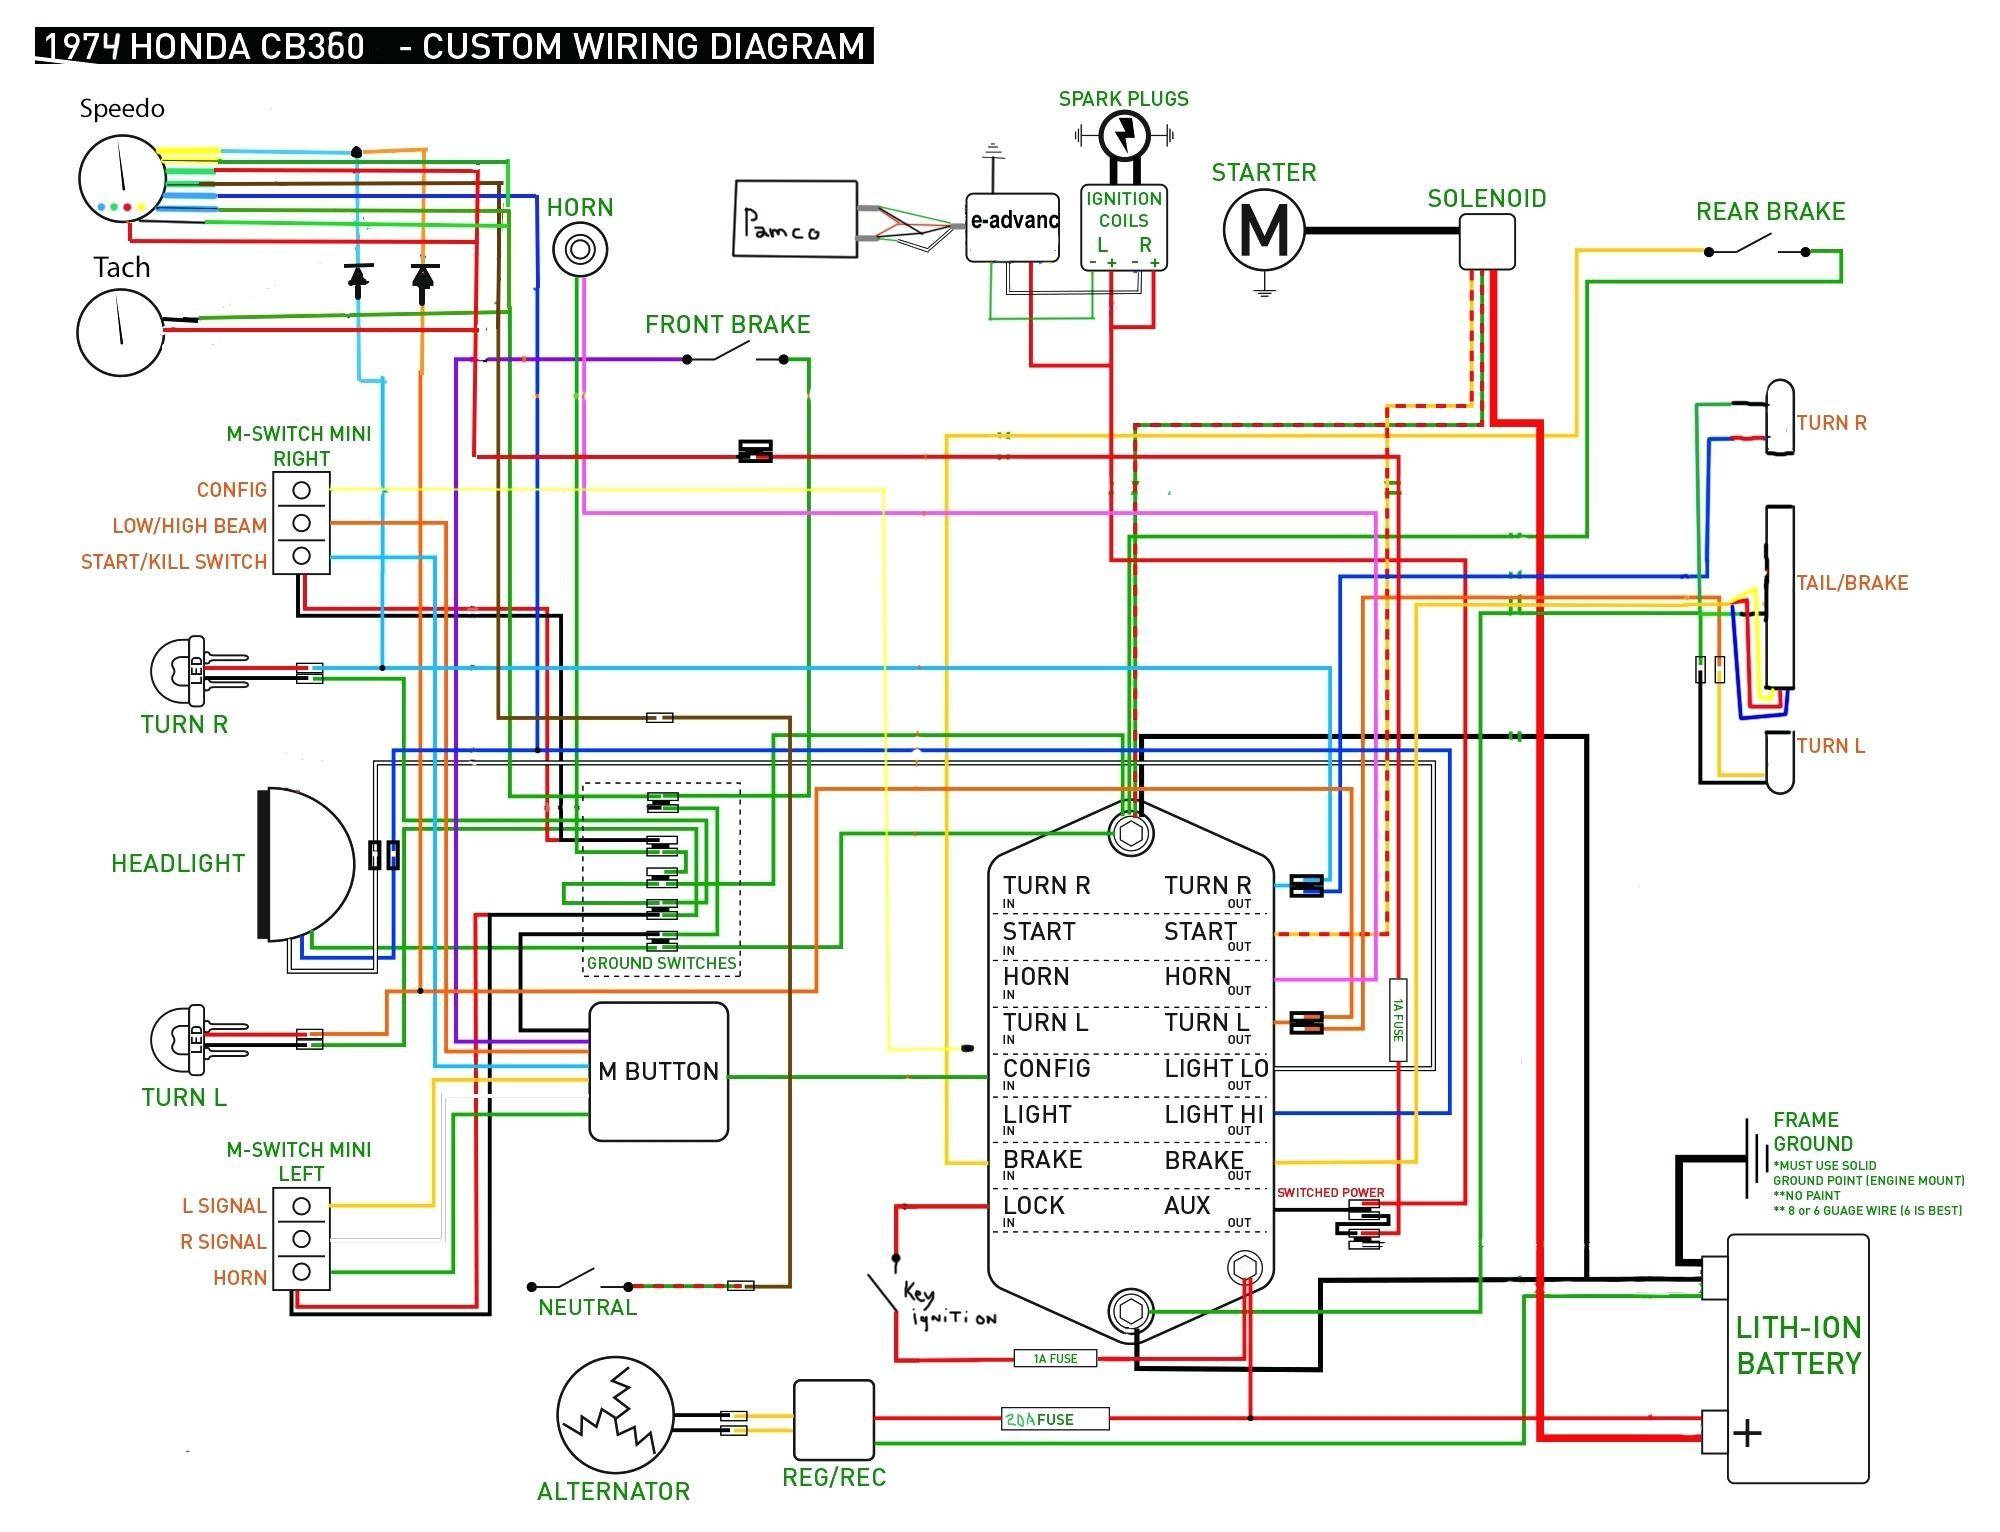 honda cb360t wiring